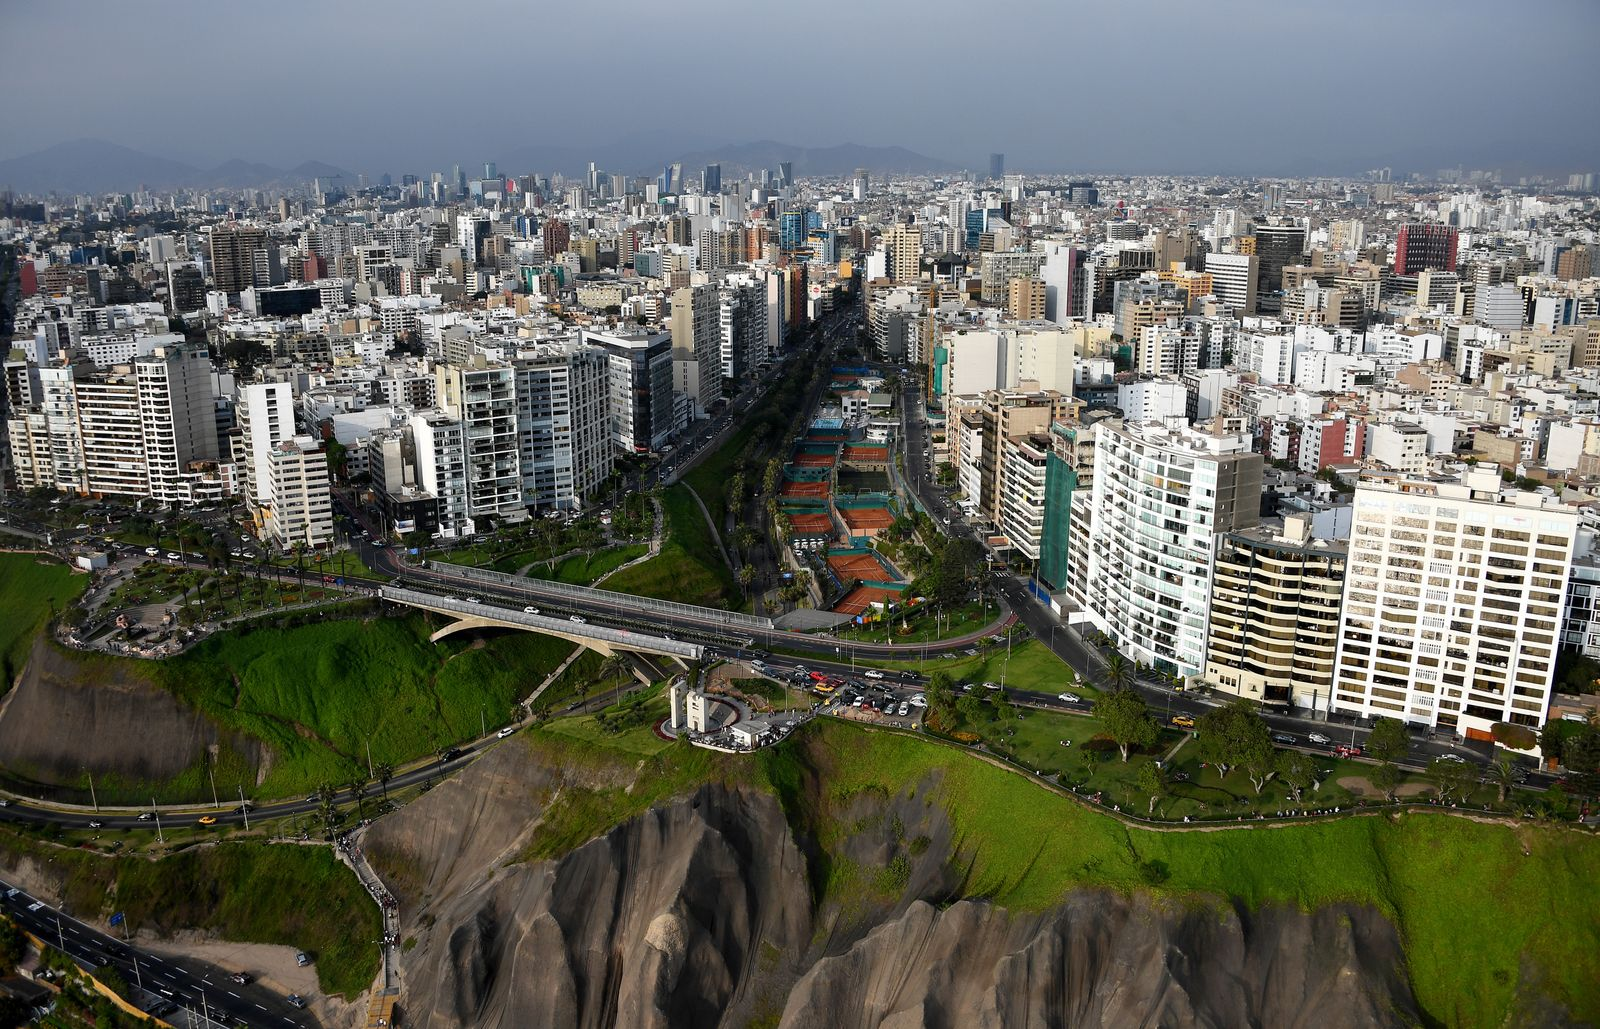 PERU-LIMA-CITY